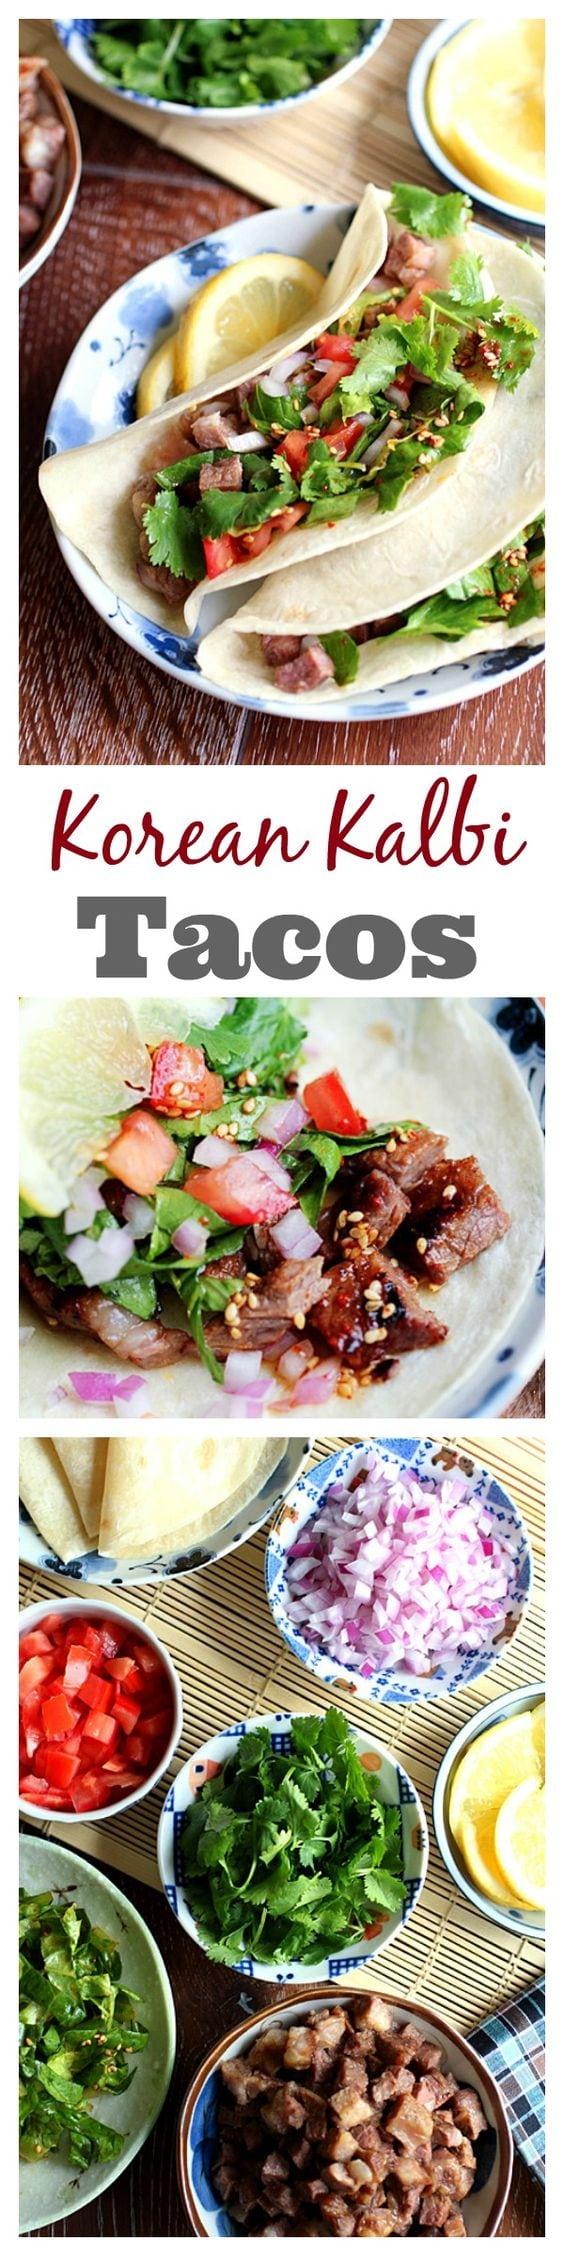 Korean kalbi (BBQ beef short rib) tacos. Amazing tacos with tender, juicy and the most delicious Korean kalbi | rasamalaysia.com